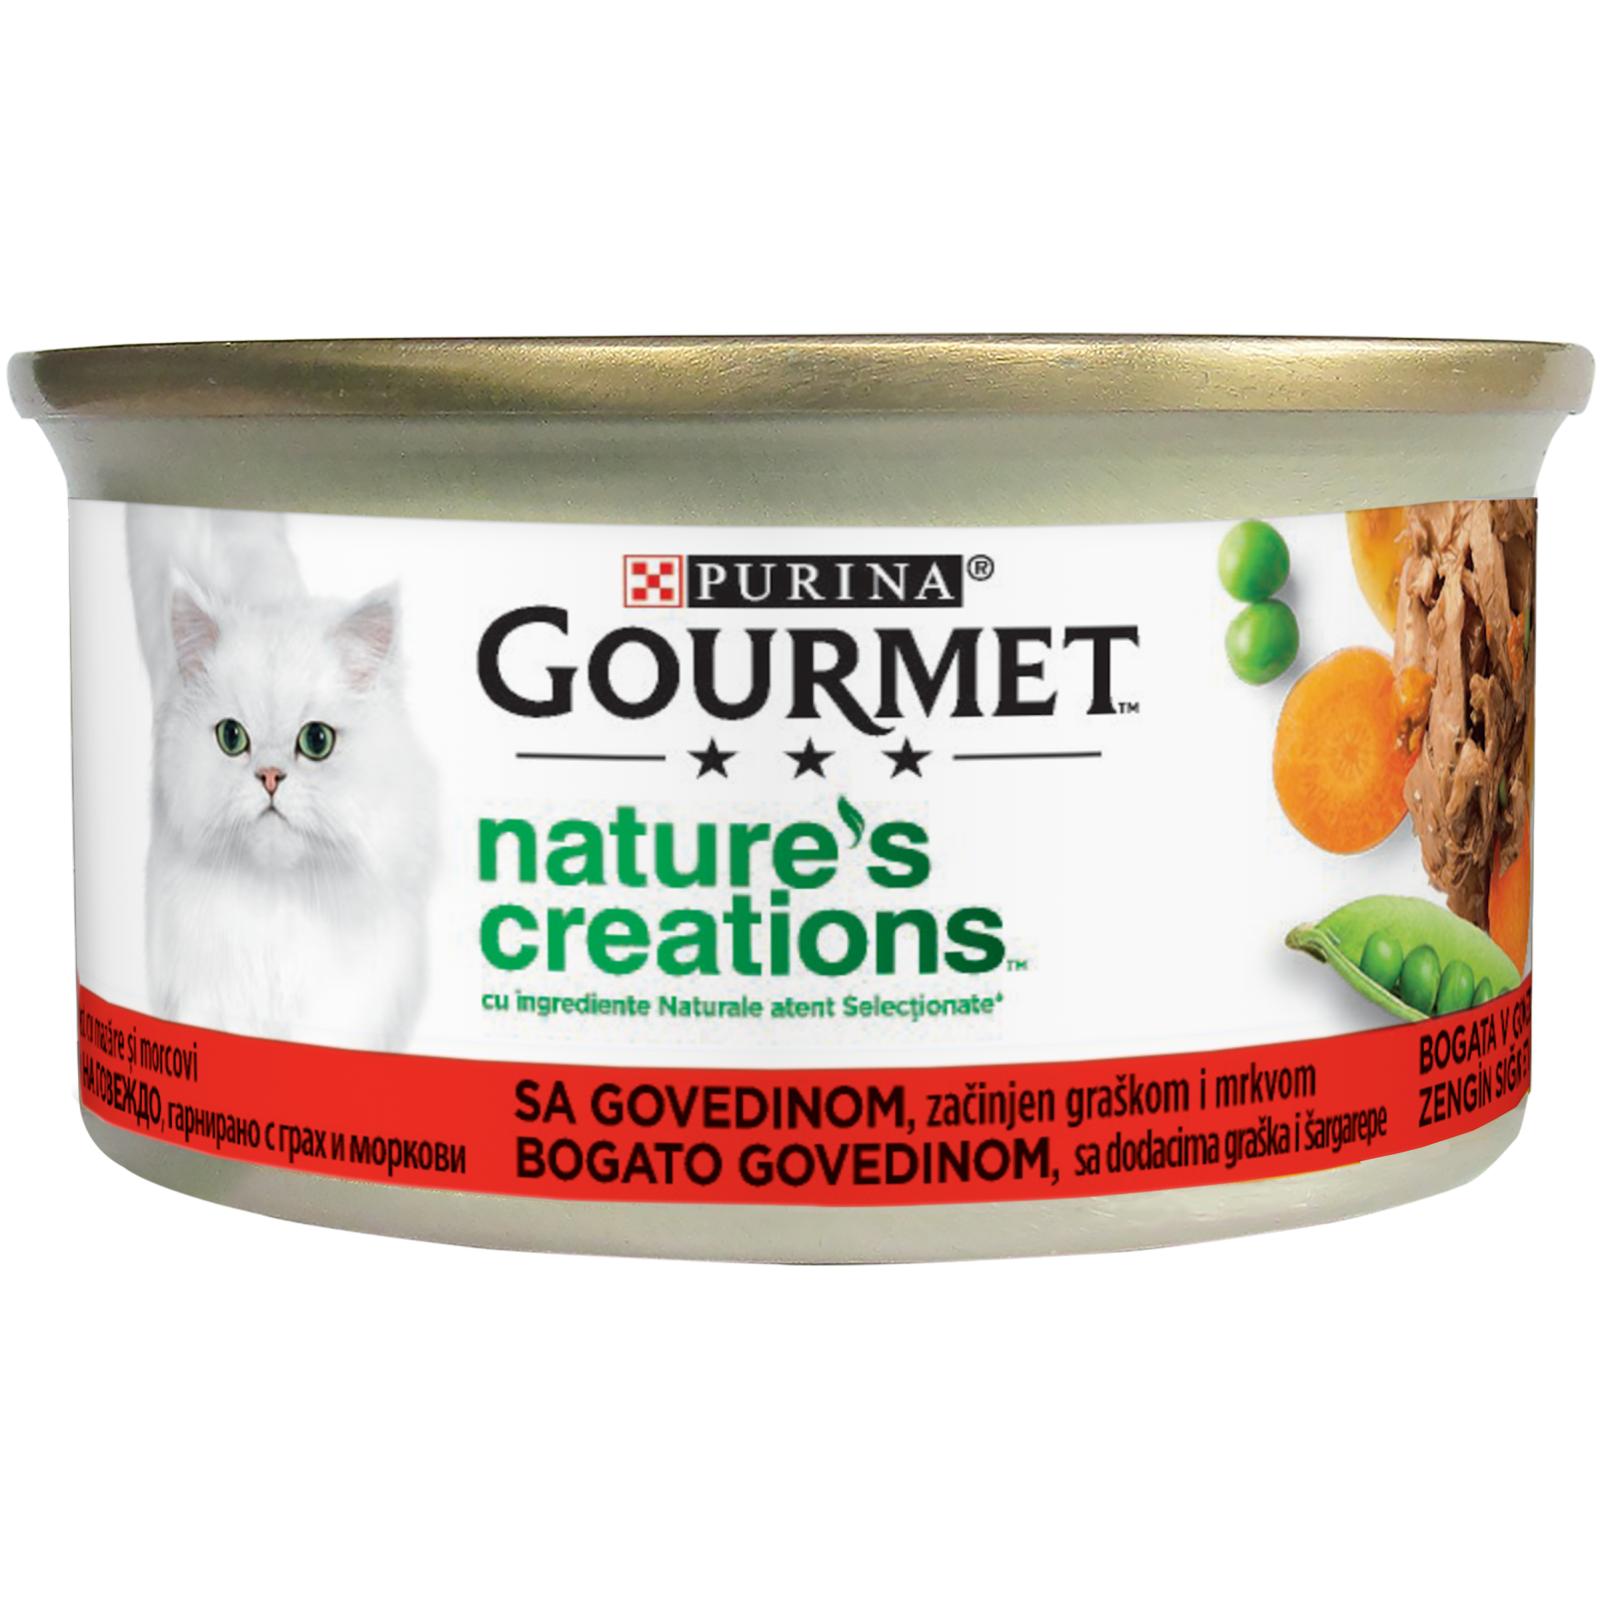 Gourmet Nature's Creations, File Vita si Mazare, 85 g imagine